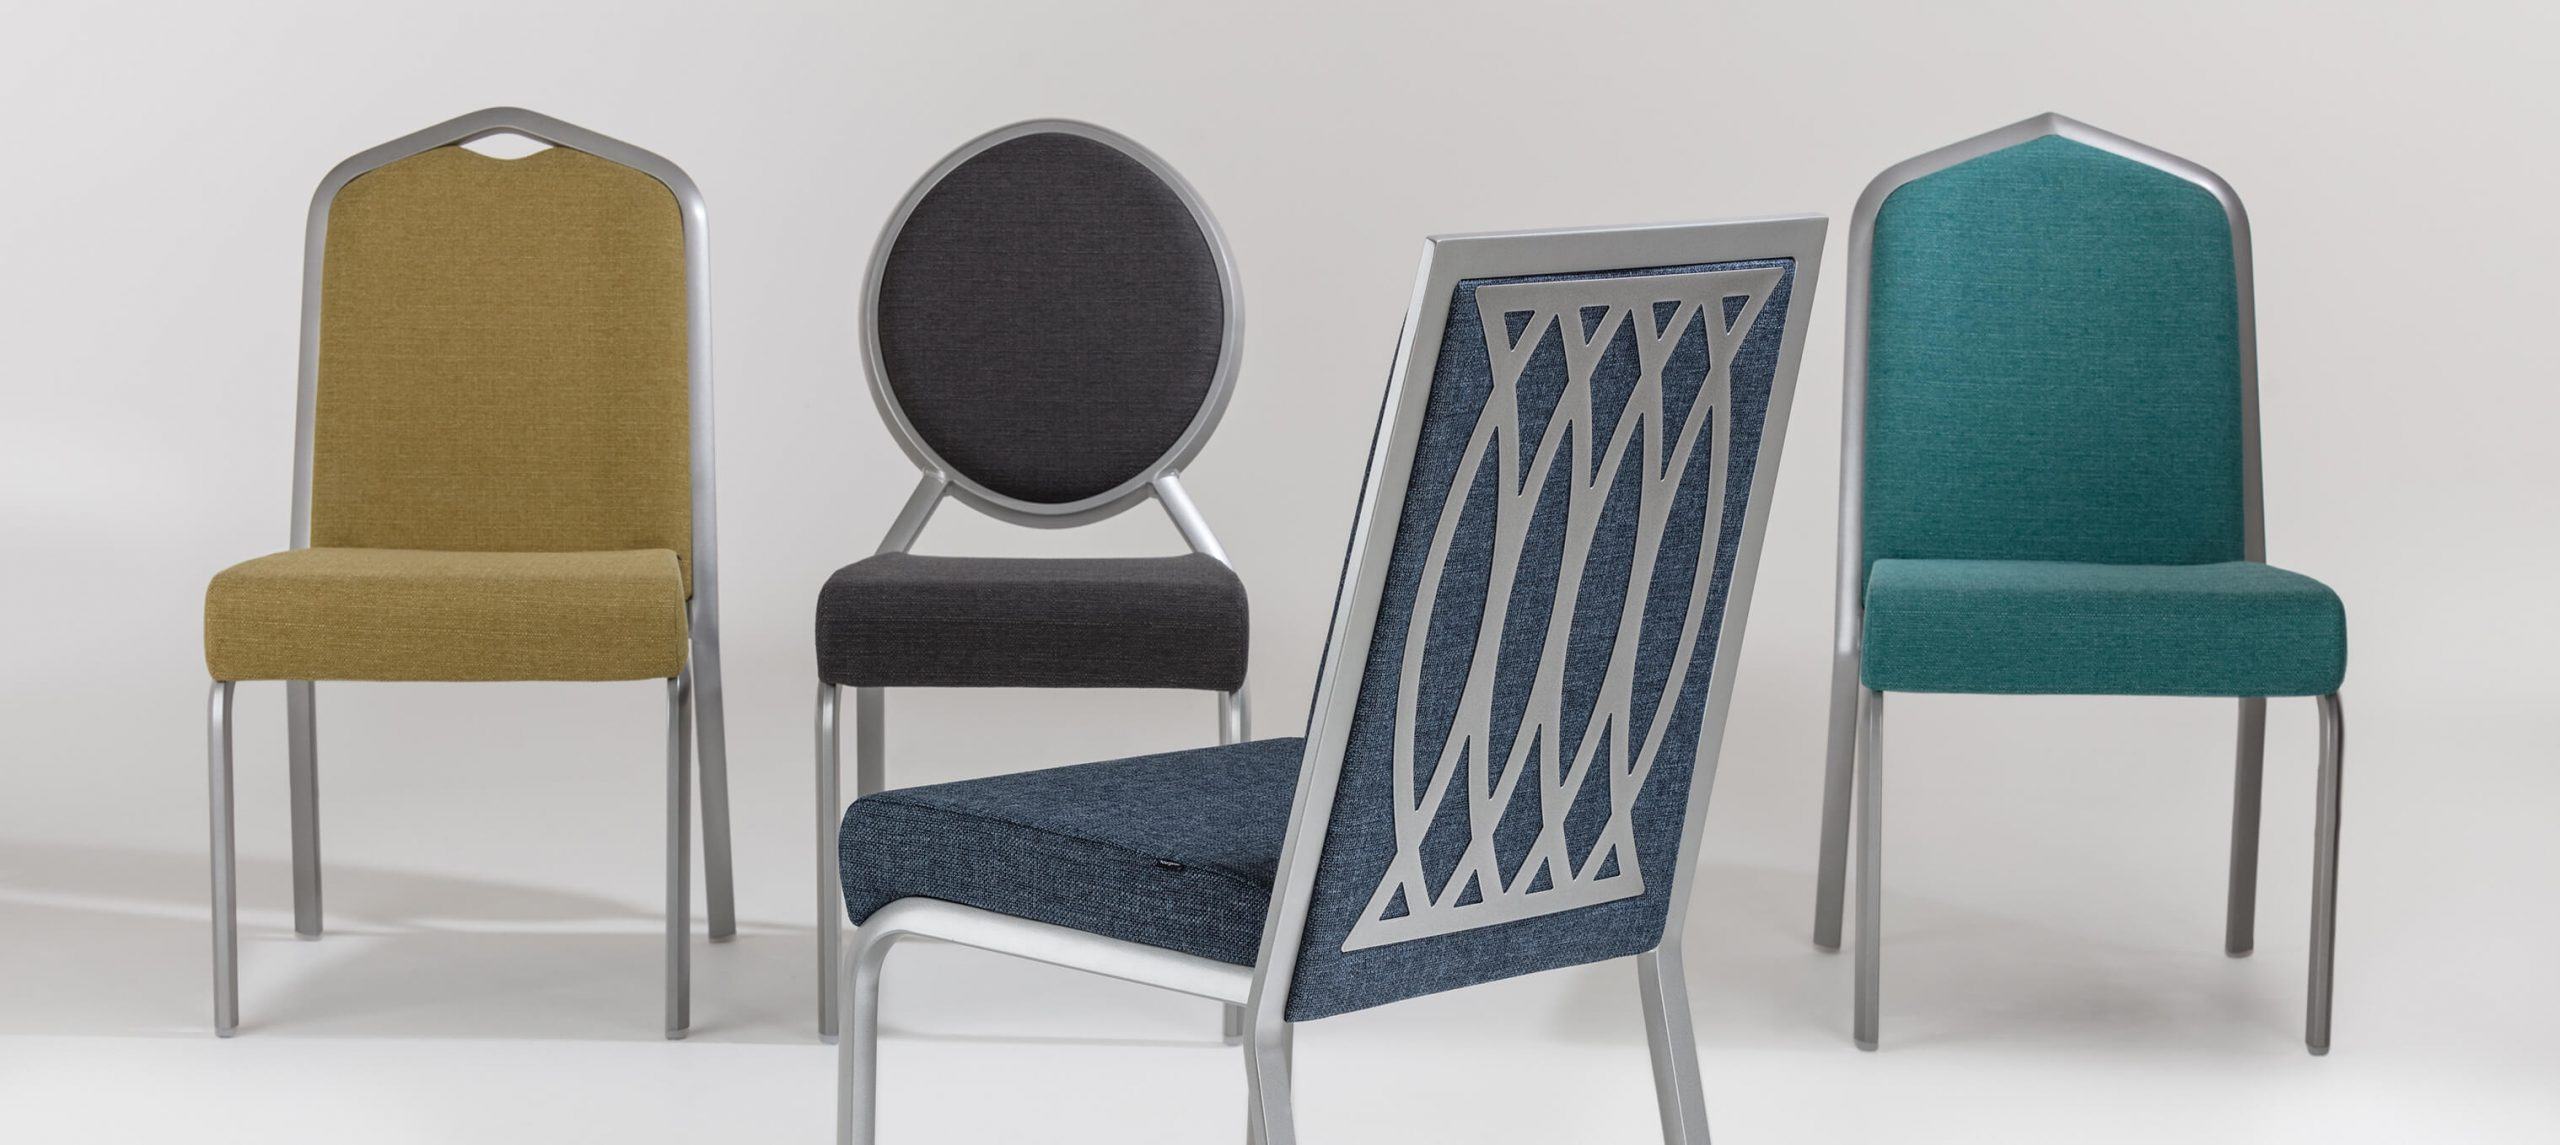 Simbia Hotel Luxury Chair Range